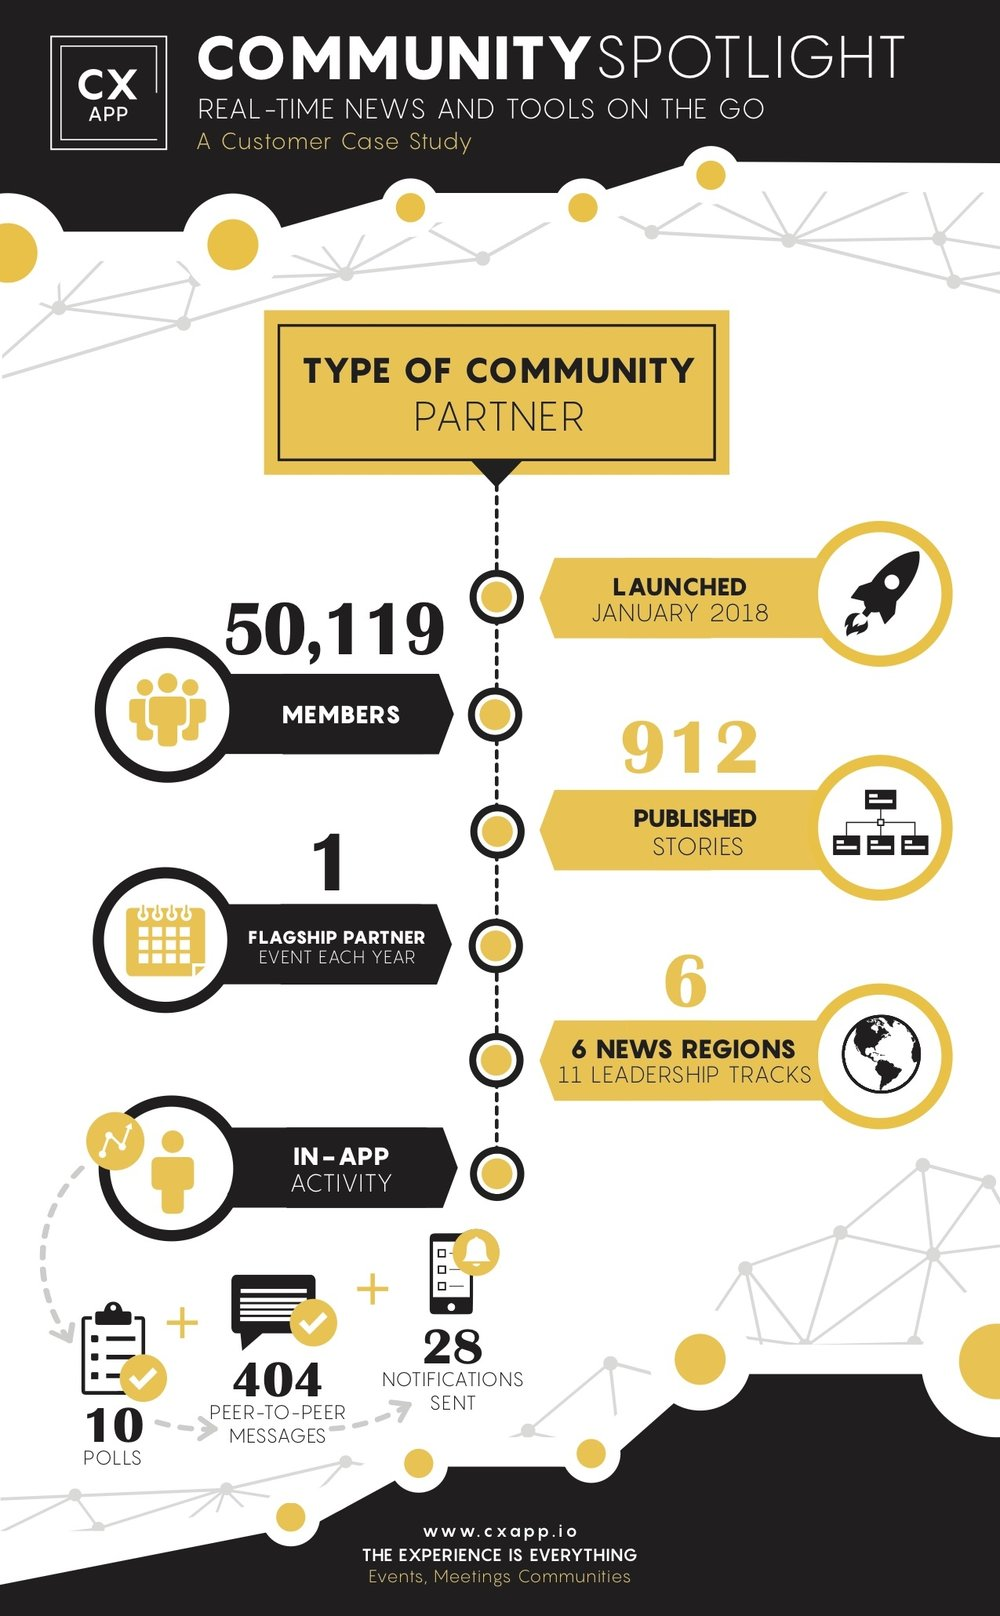 Community Spotlight: A Mobile Ecosystem for Partner Engagement